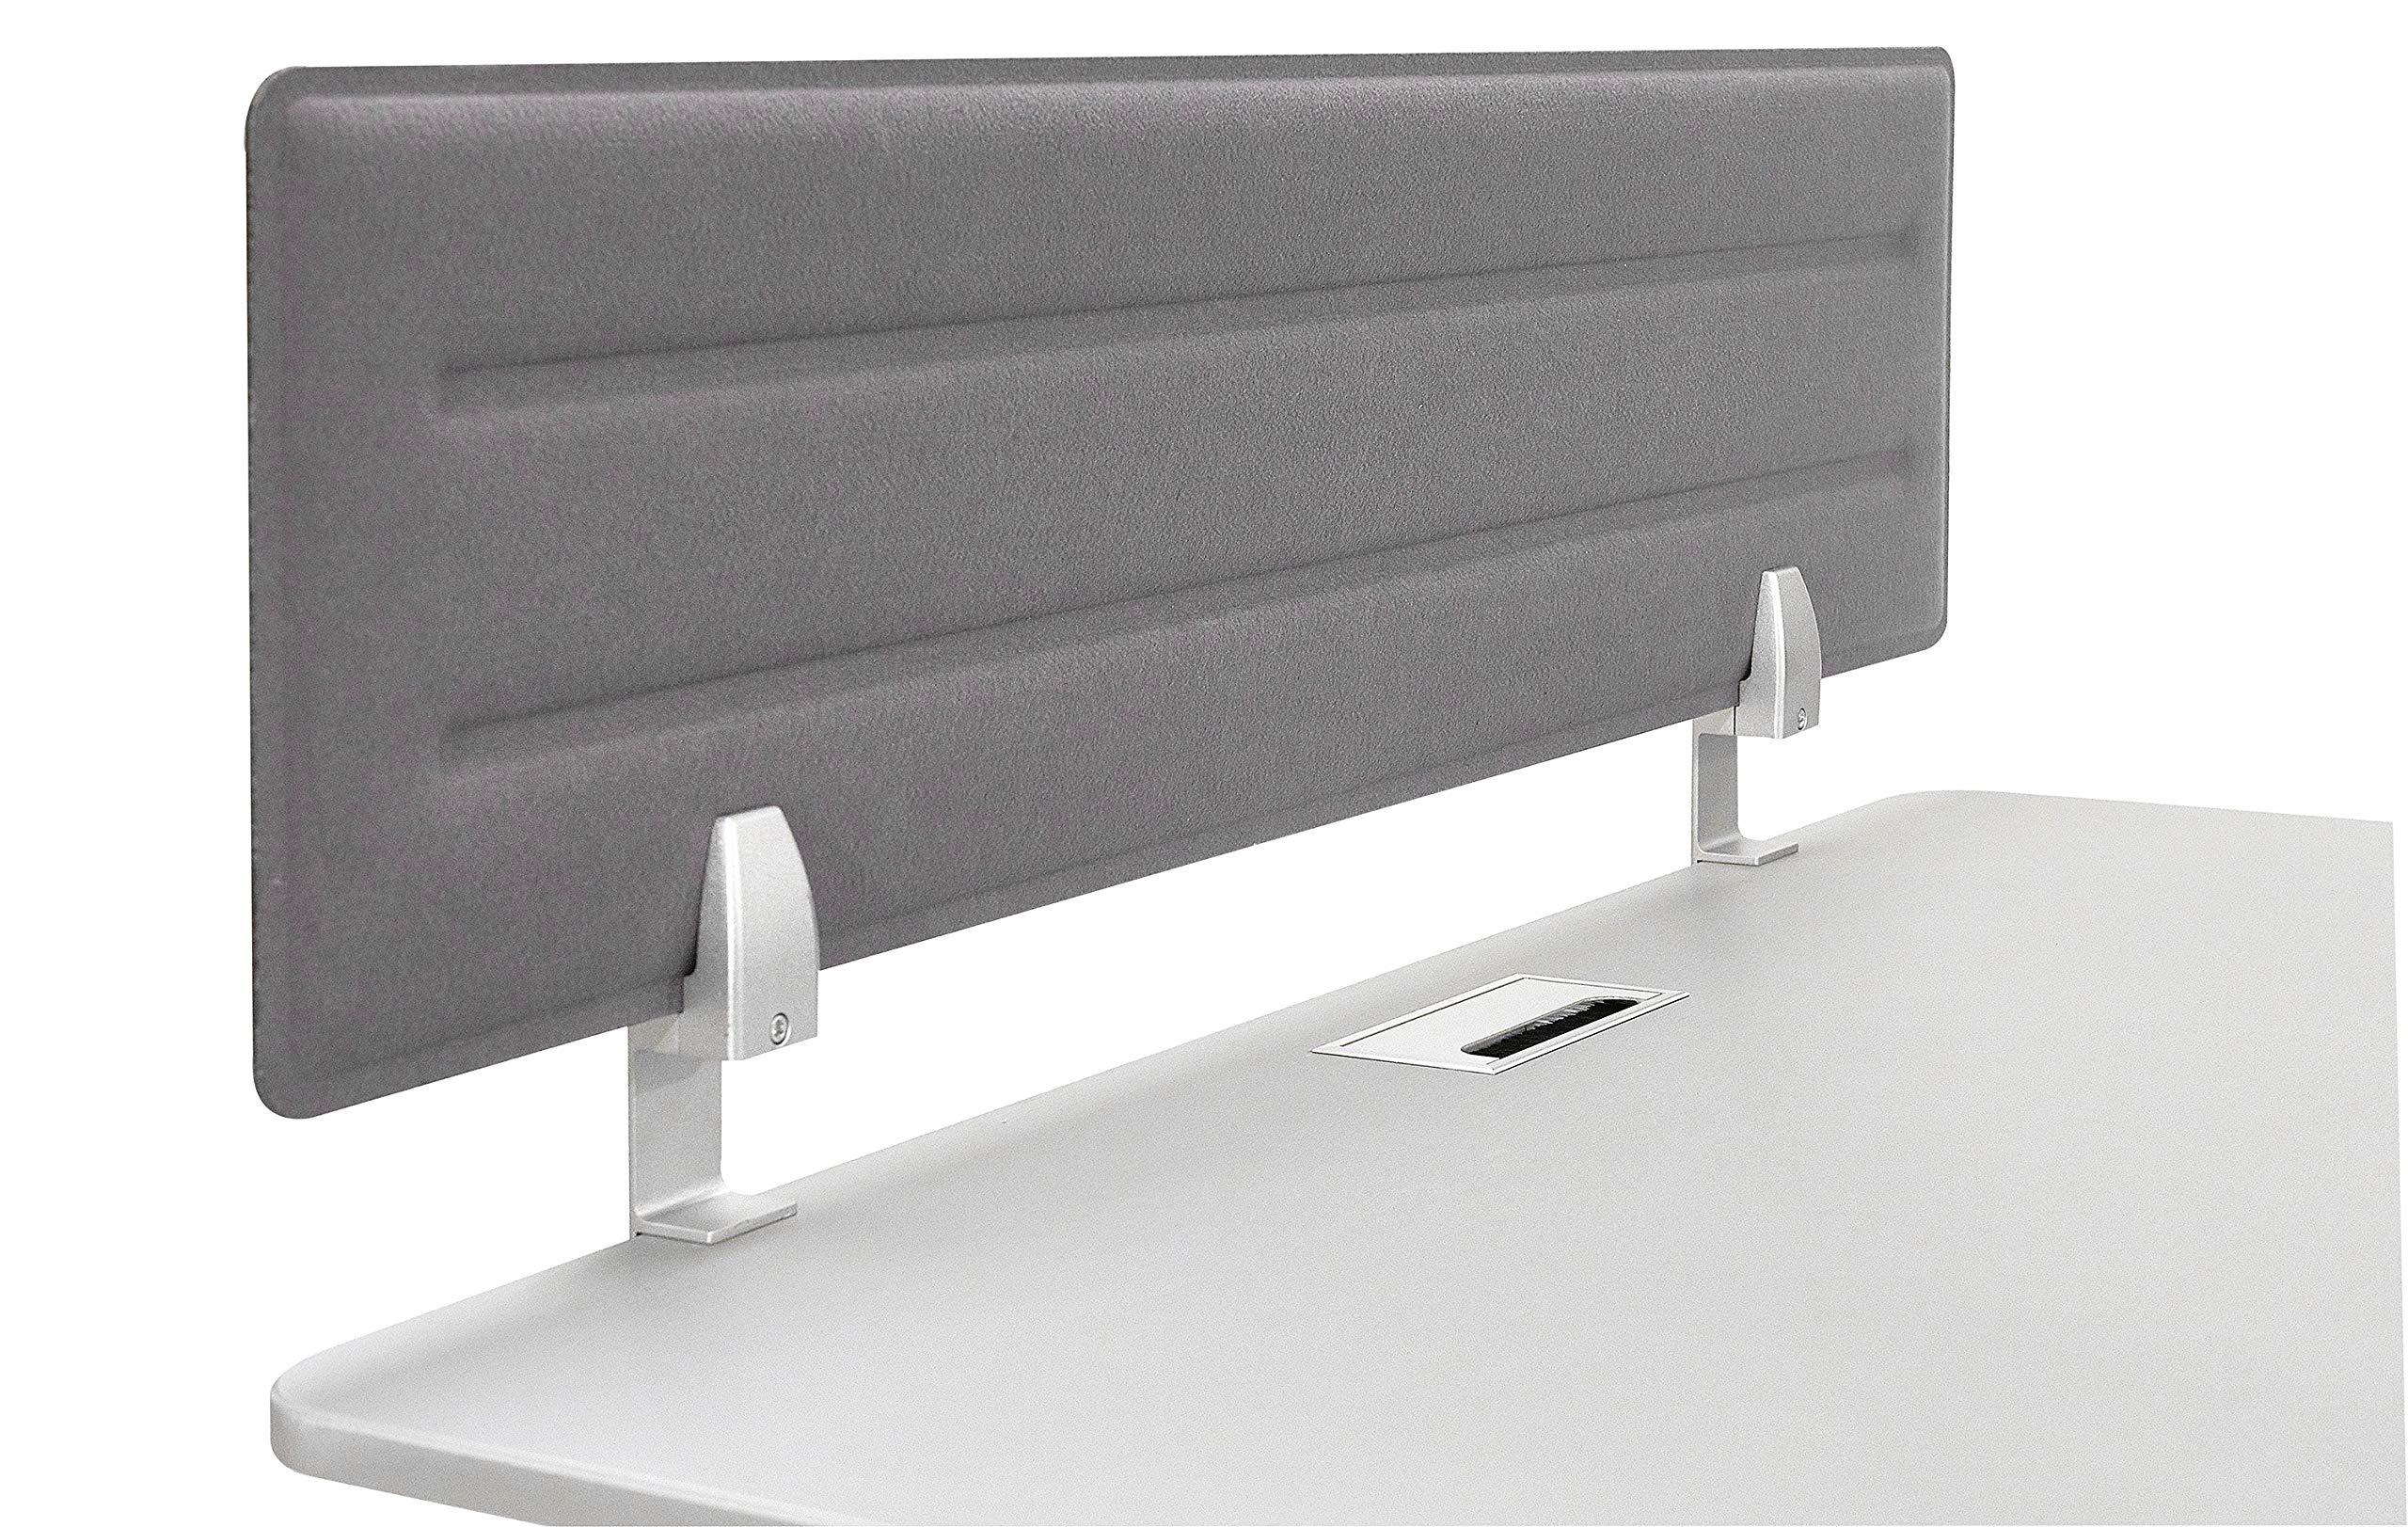 Iceberg 68917 Desktop Tackable Felt Privacy Panel, 46'' x 15'', Gray - Reduce Visual Distractions